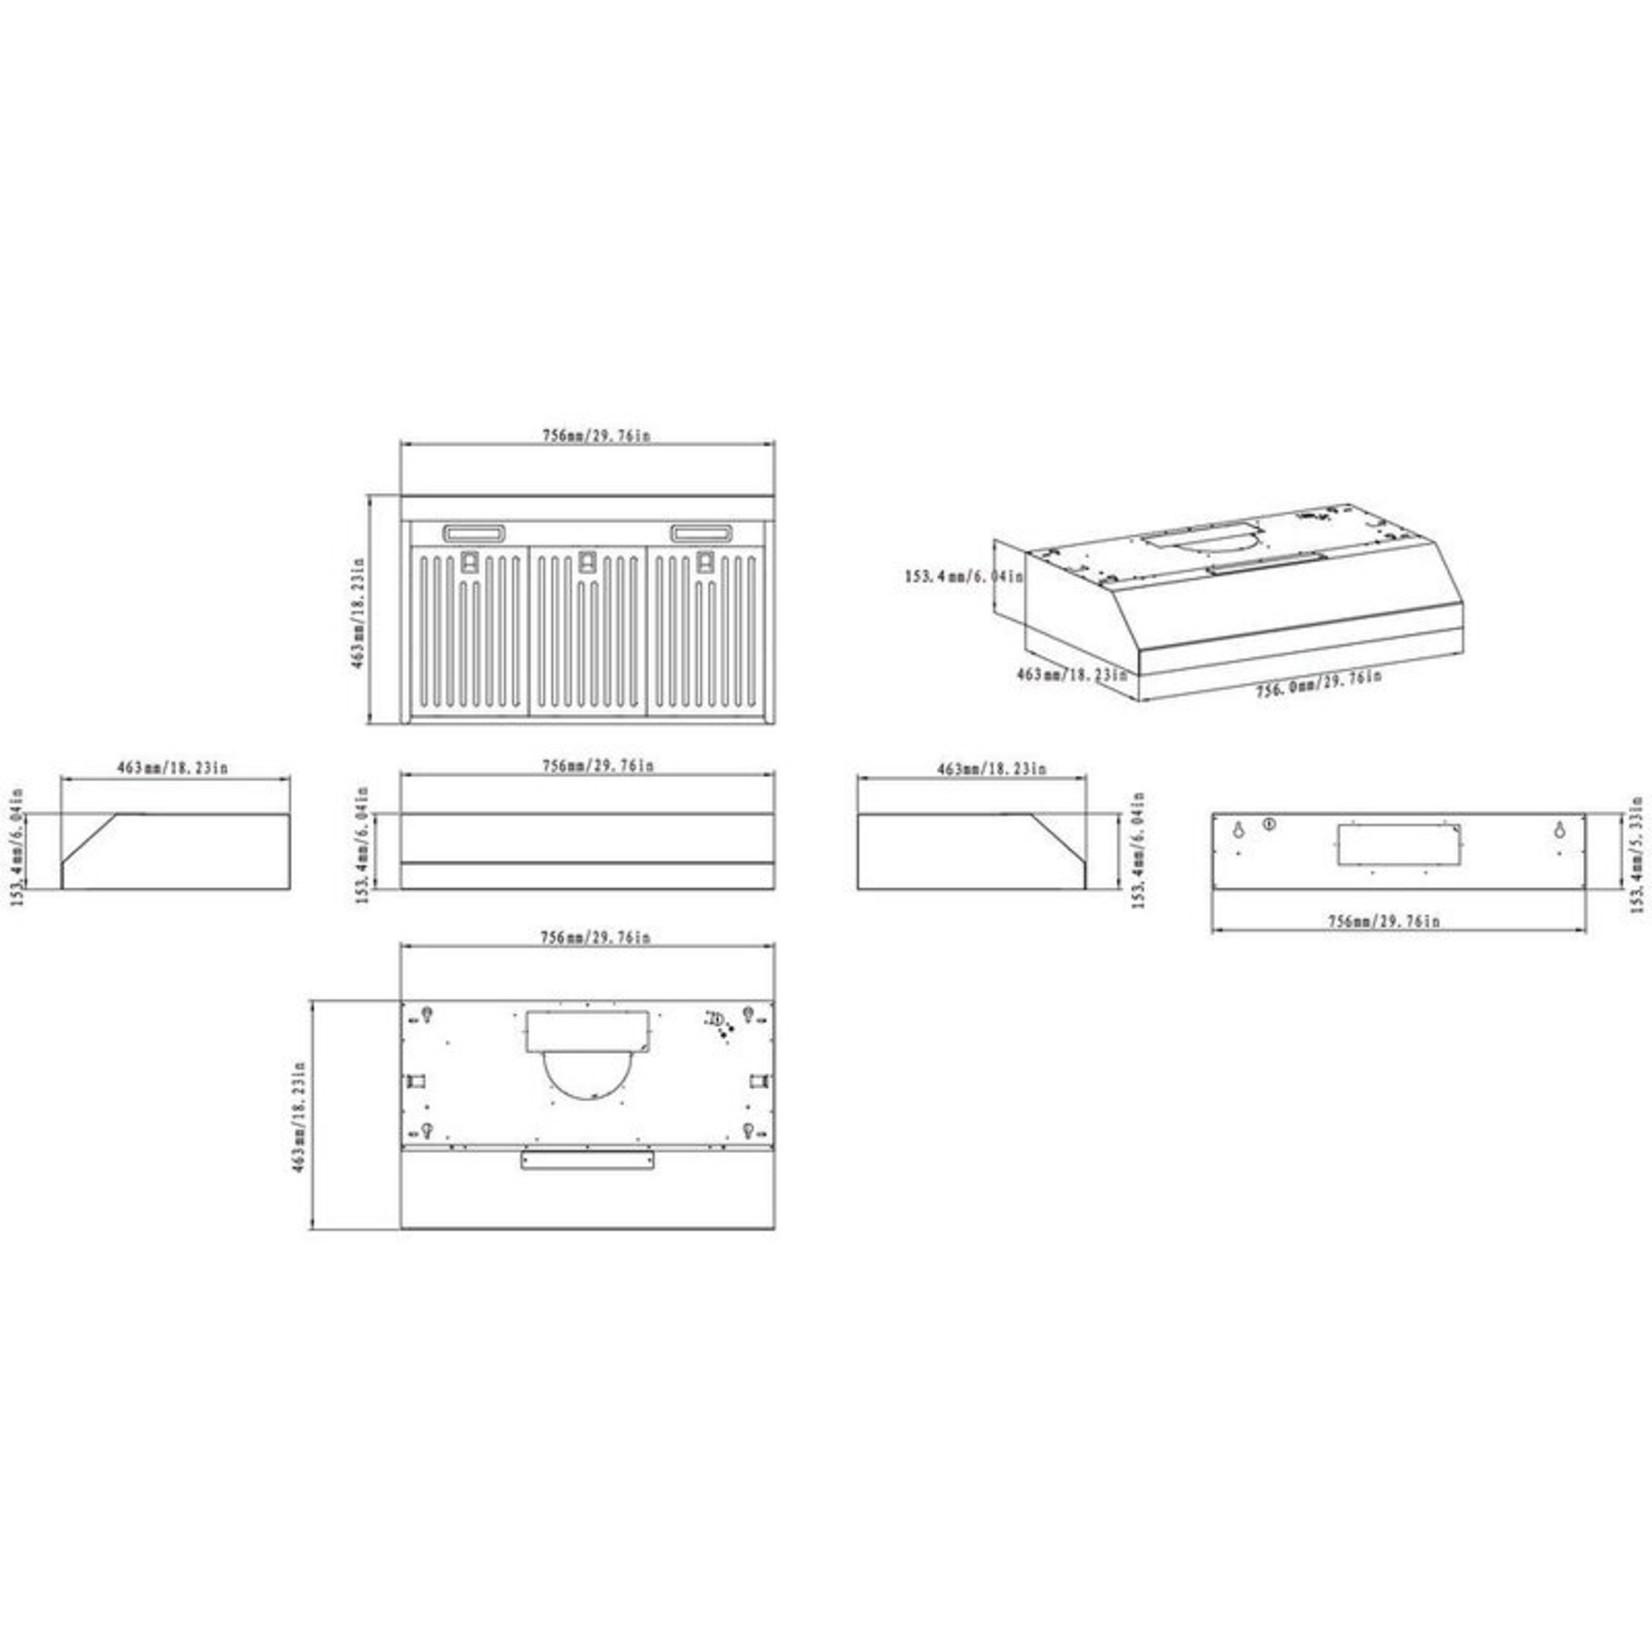 "*30"" 111 Series 500 CFM Convertible Under Cabinet Range Hood in Stainless Steel"